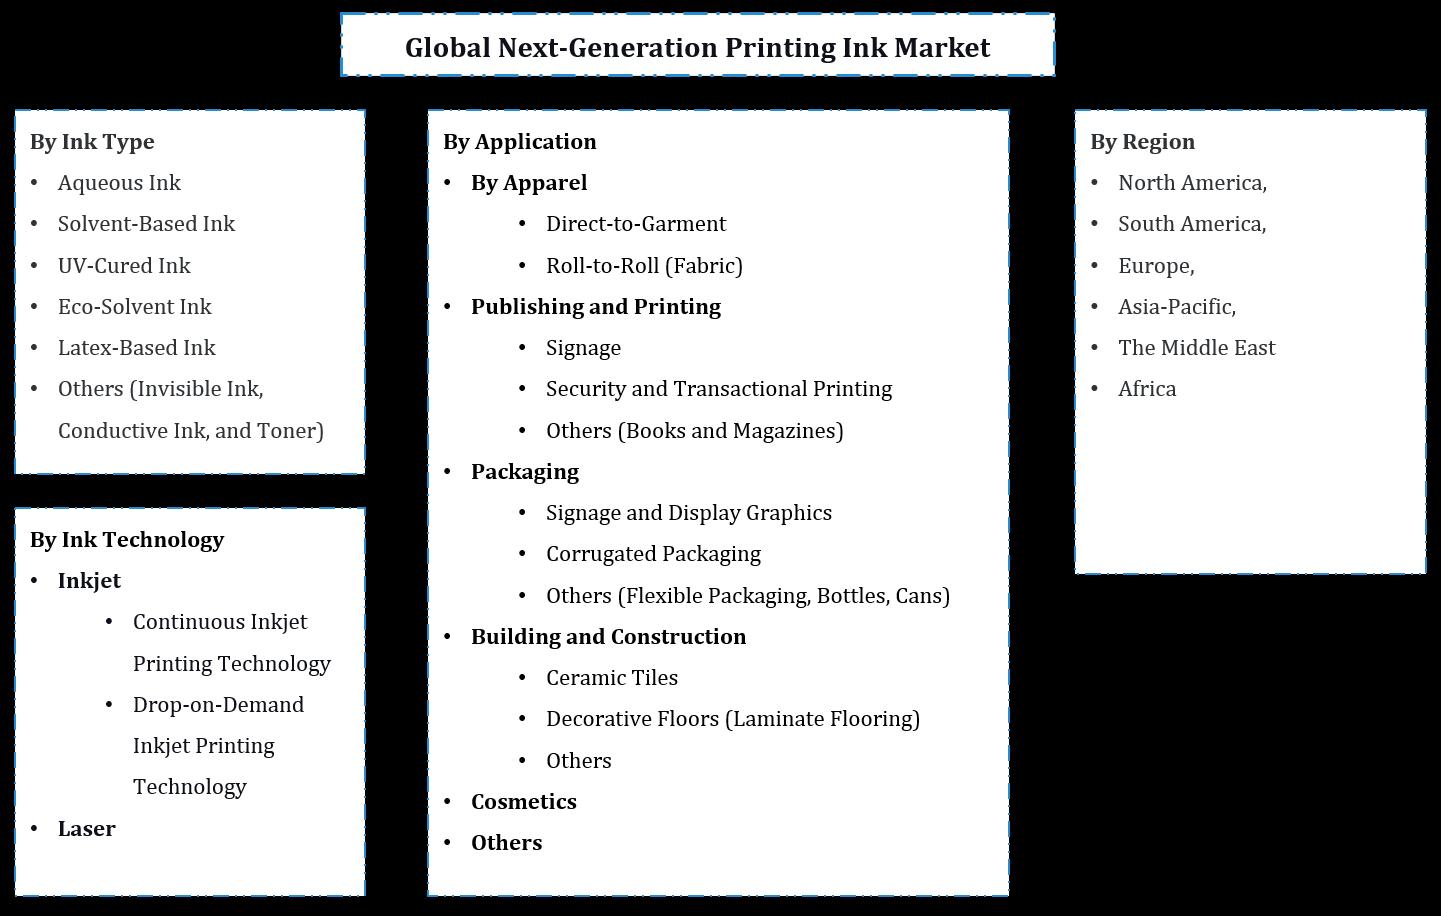 Global Next-Generation Printing Ink Market Segmentation